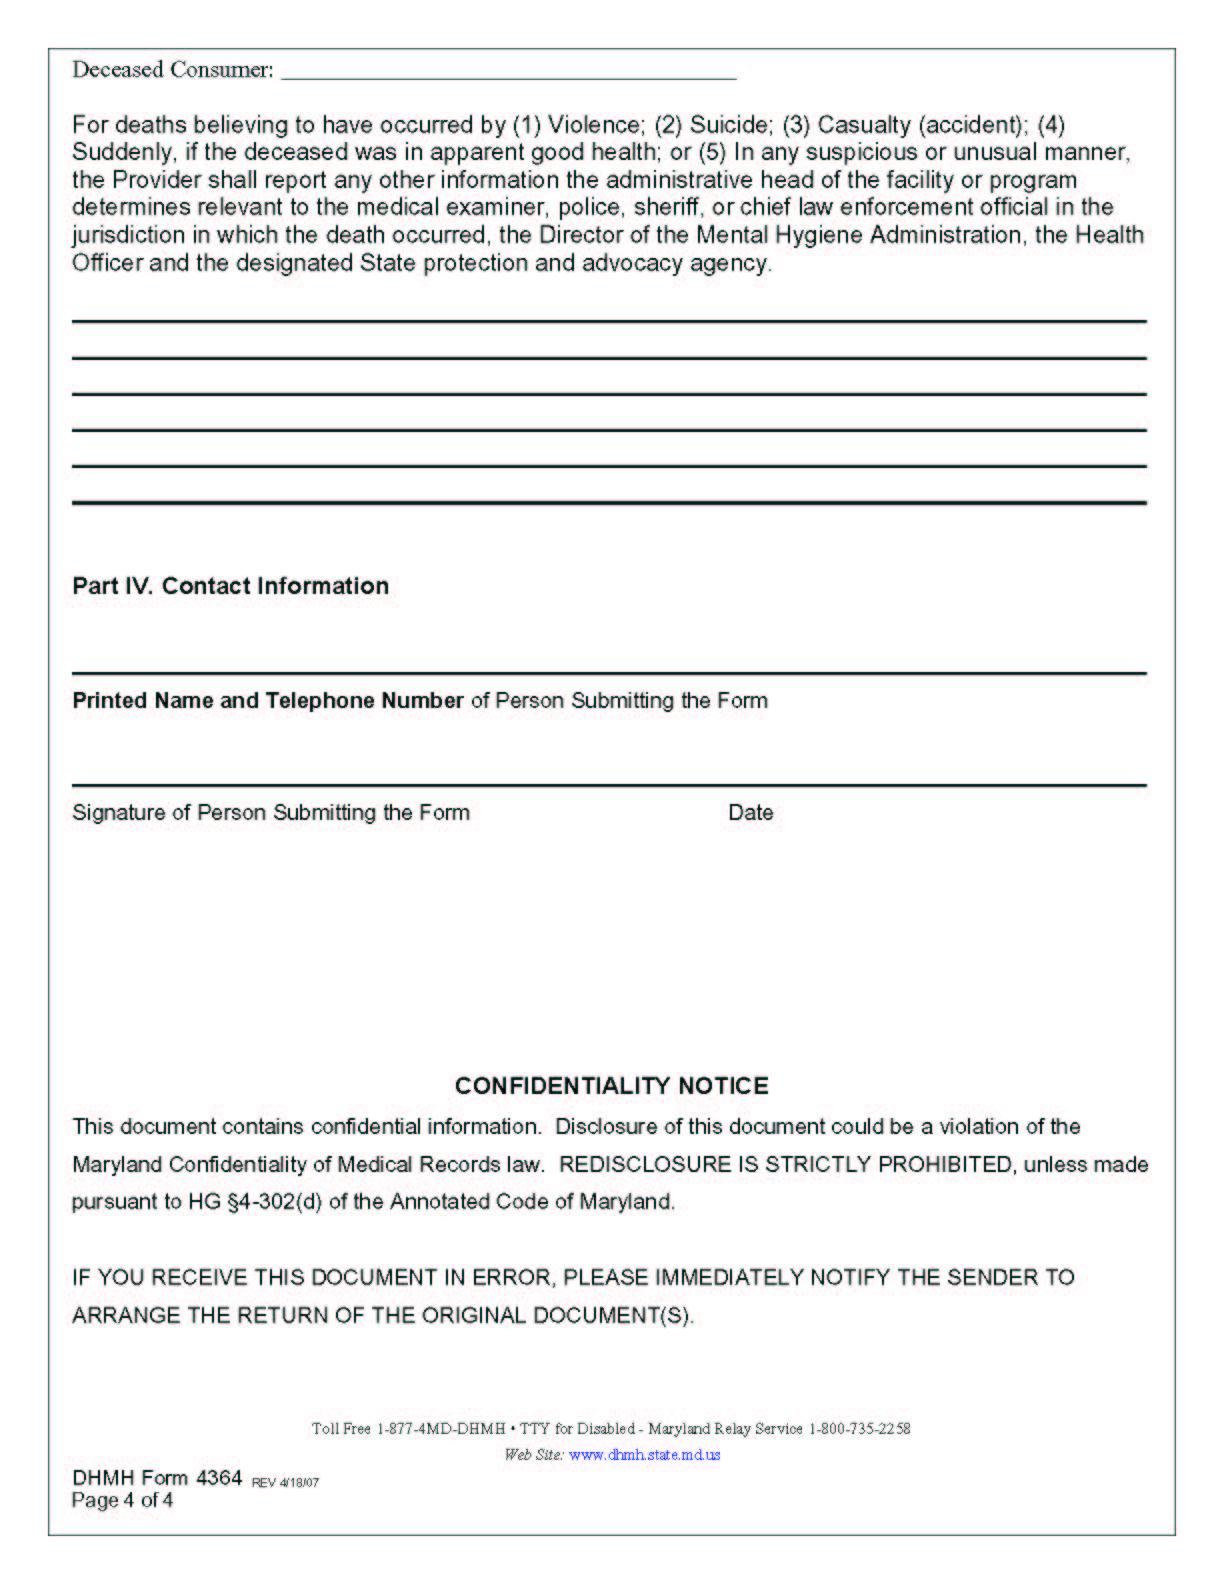 Anne Arundel County Mental Health Agency Inc Forms